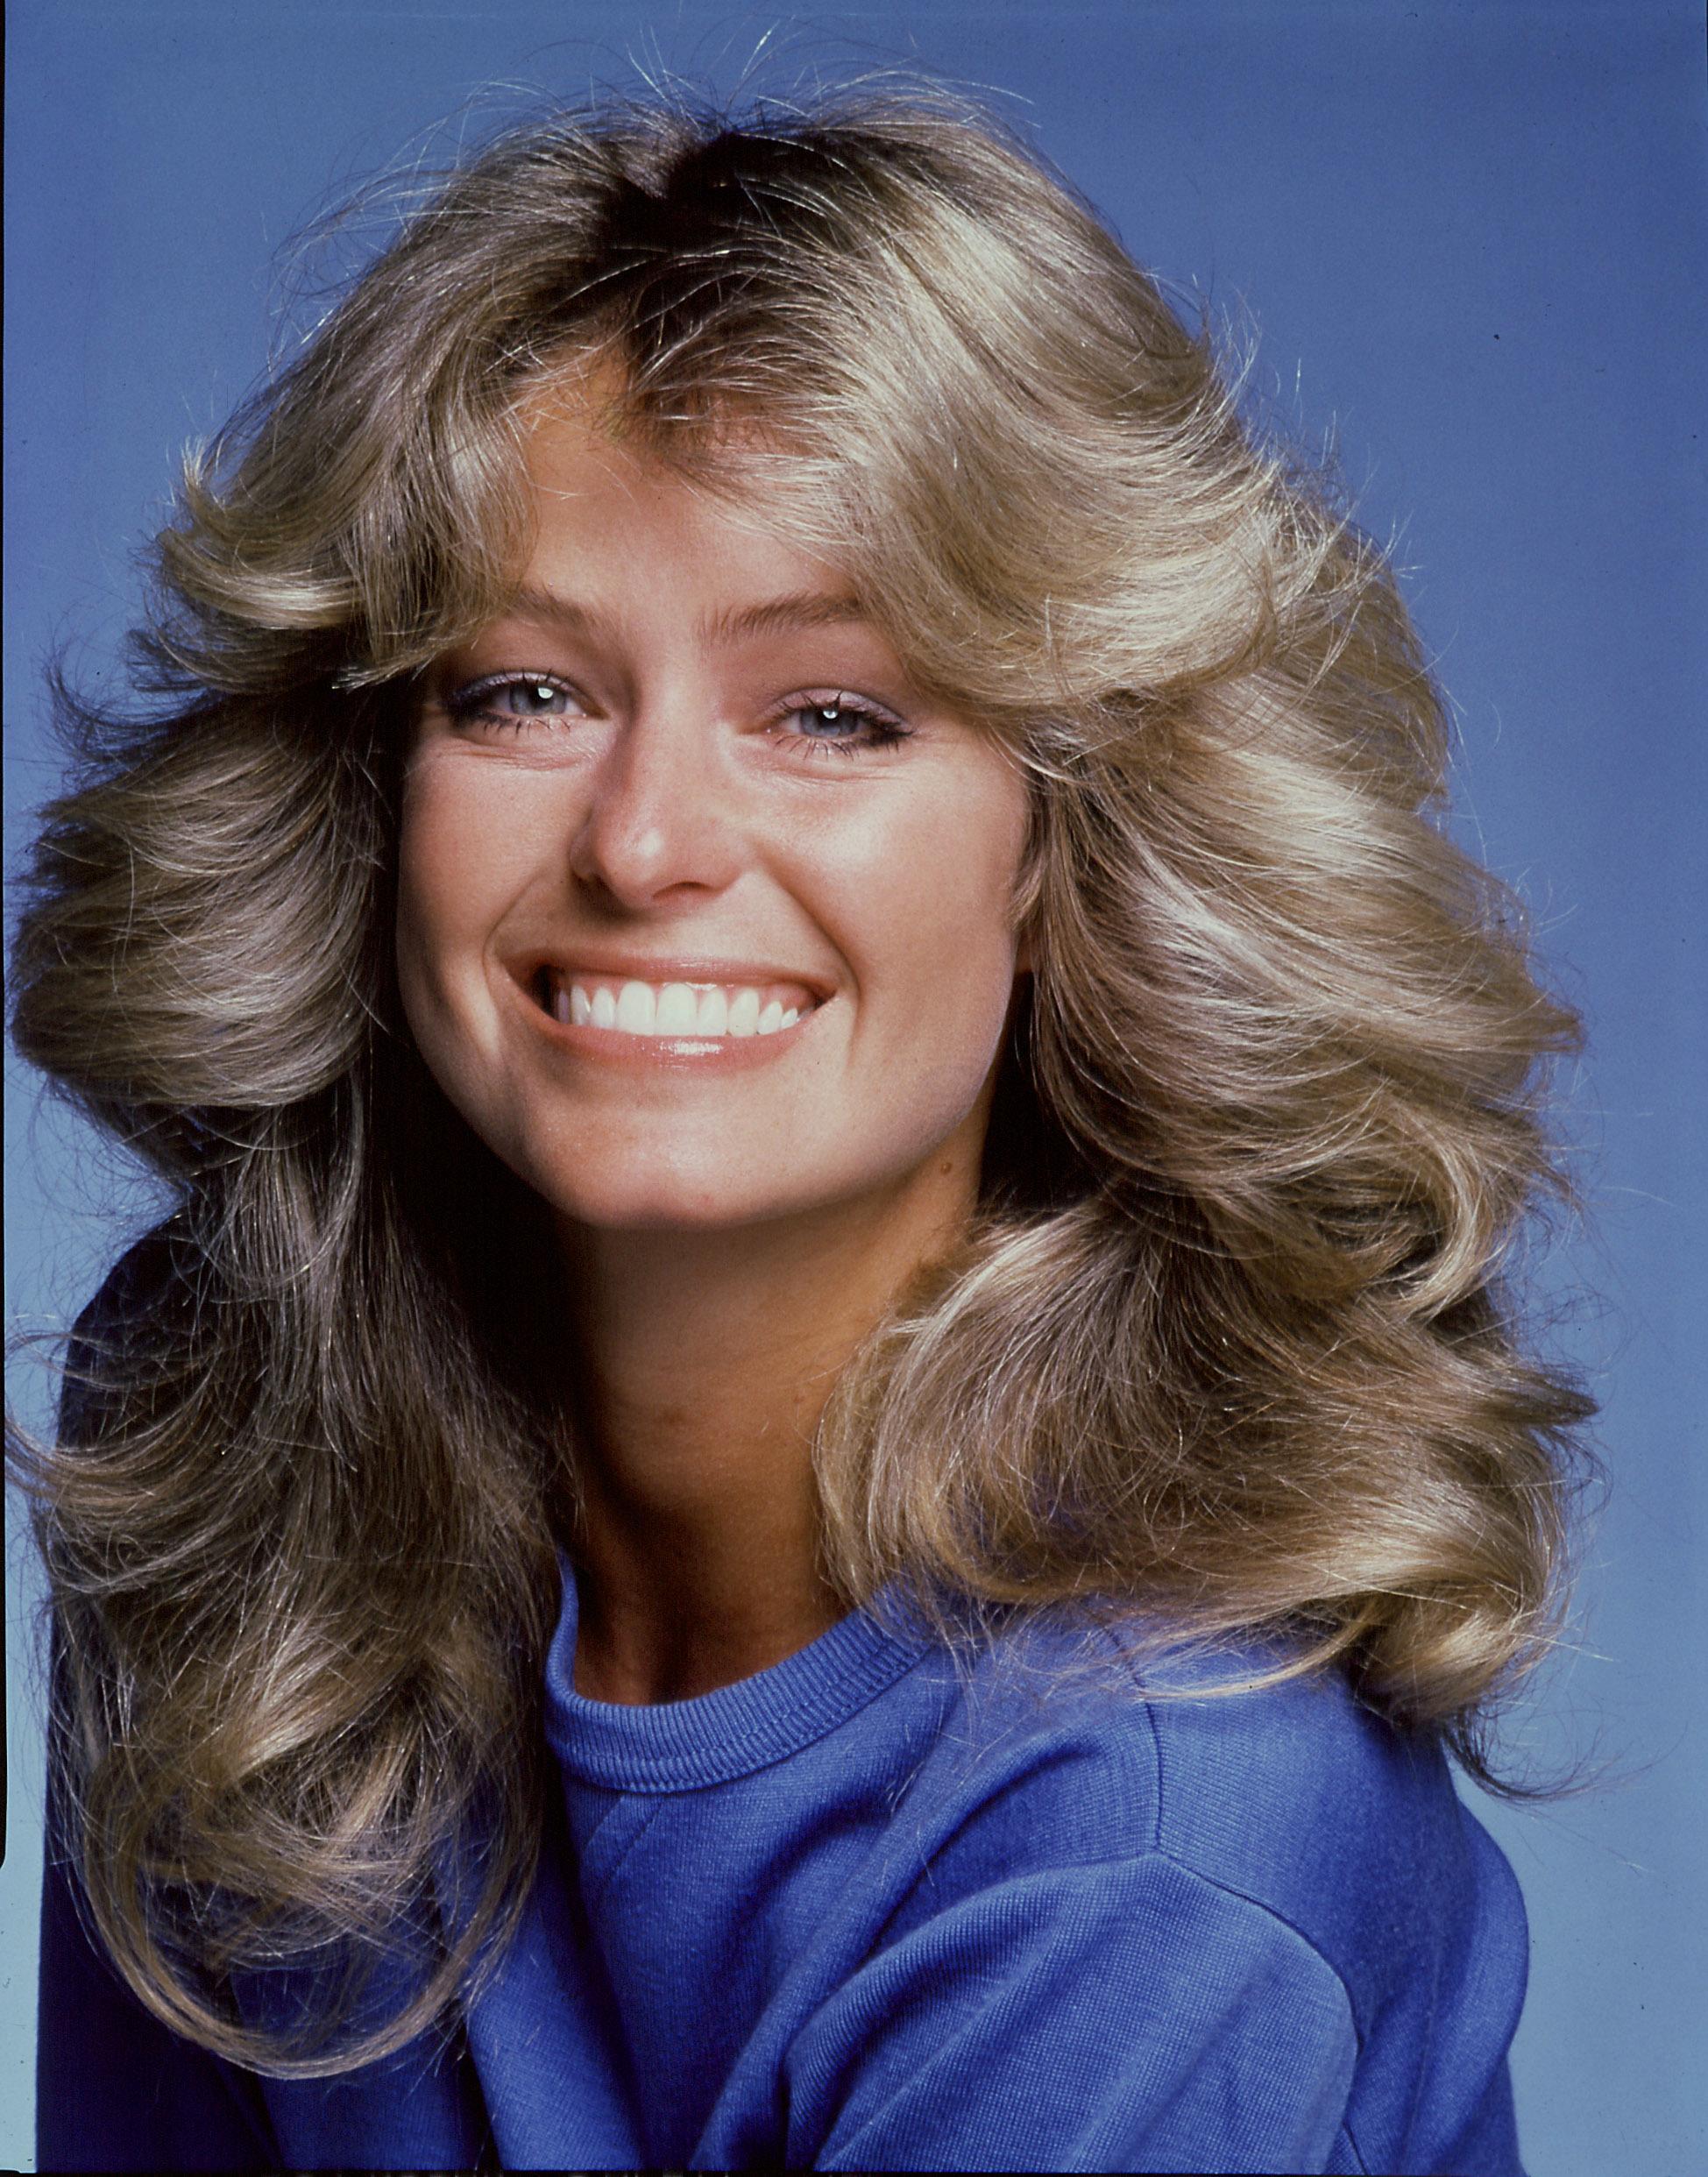 70s hairstyles: Farrah Fawcett long golden blonde 70s flipped out waves wearing a blue top